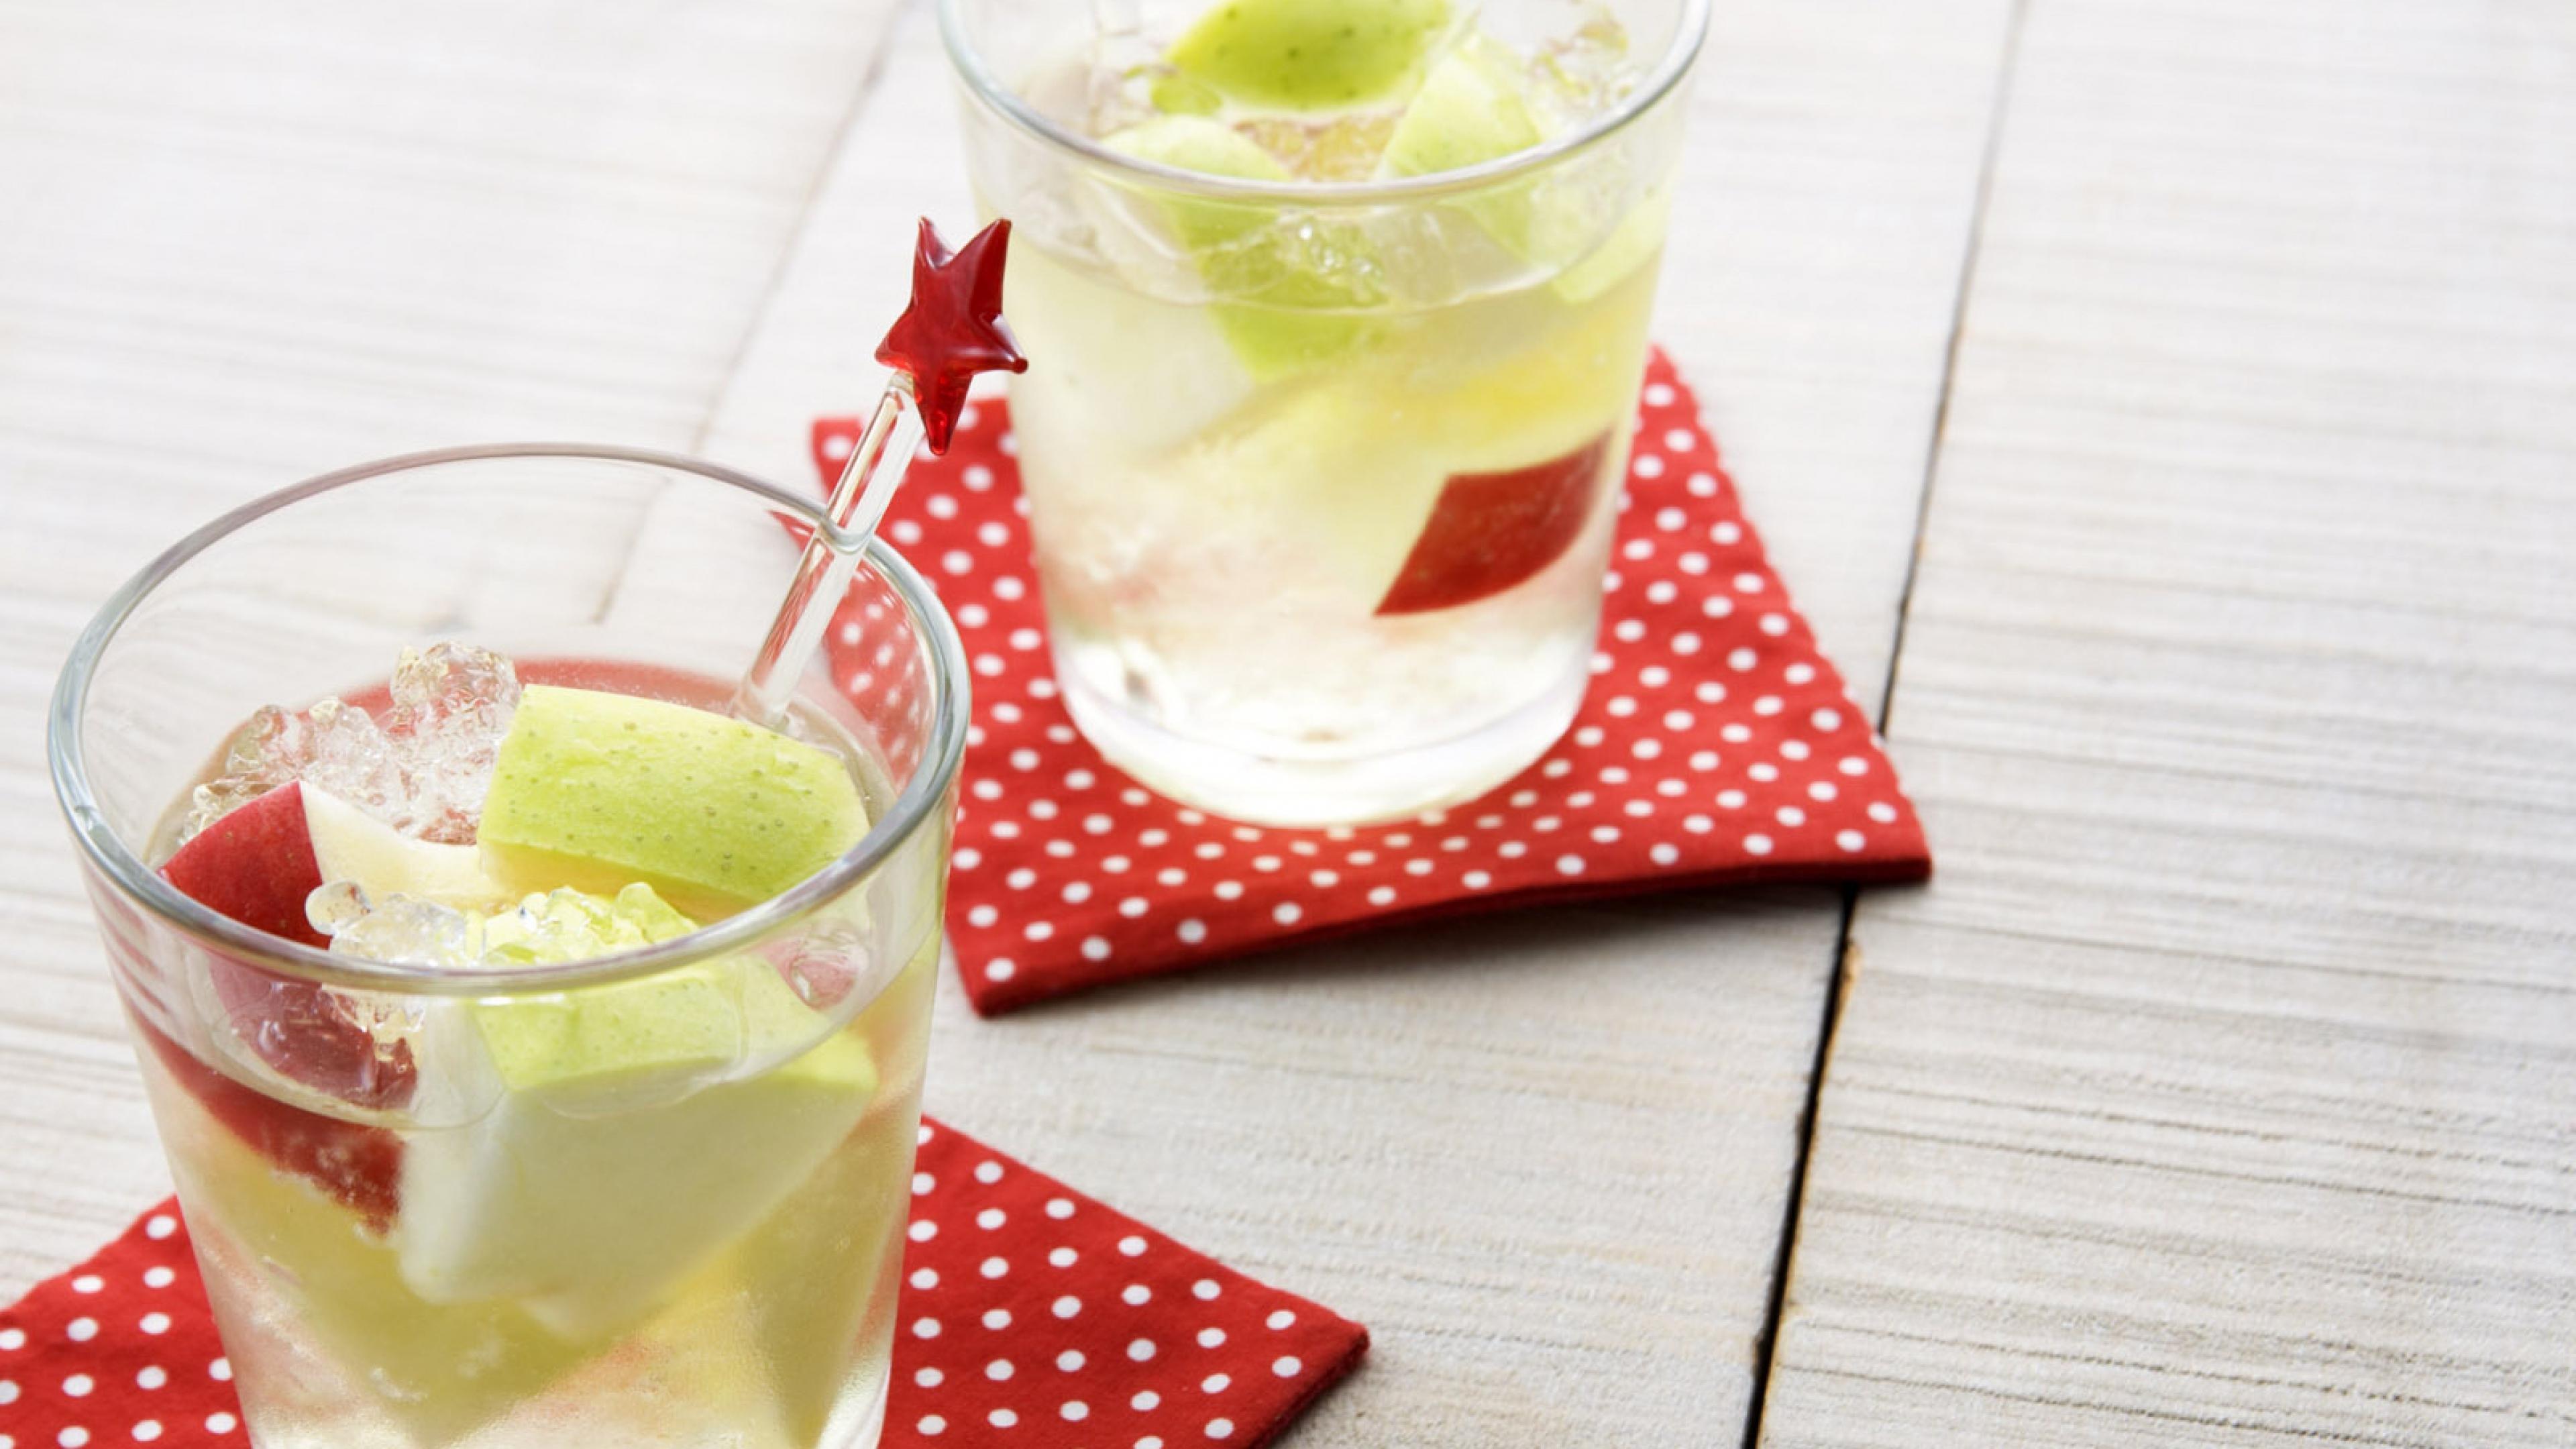 drink_glass_ice_fruit_88272_3840x2160